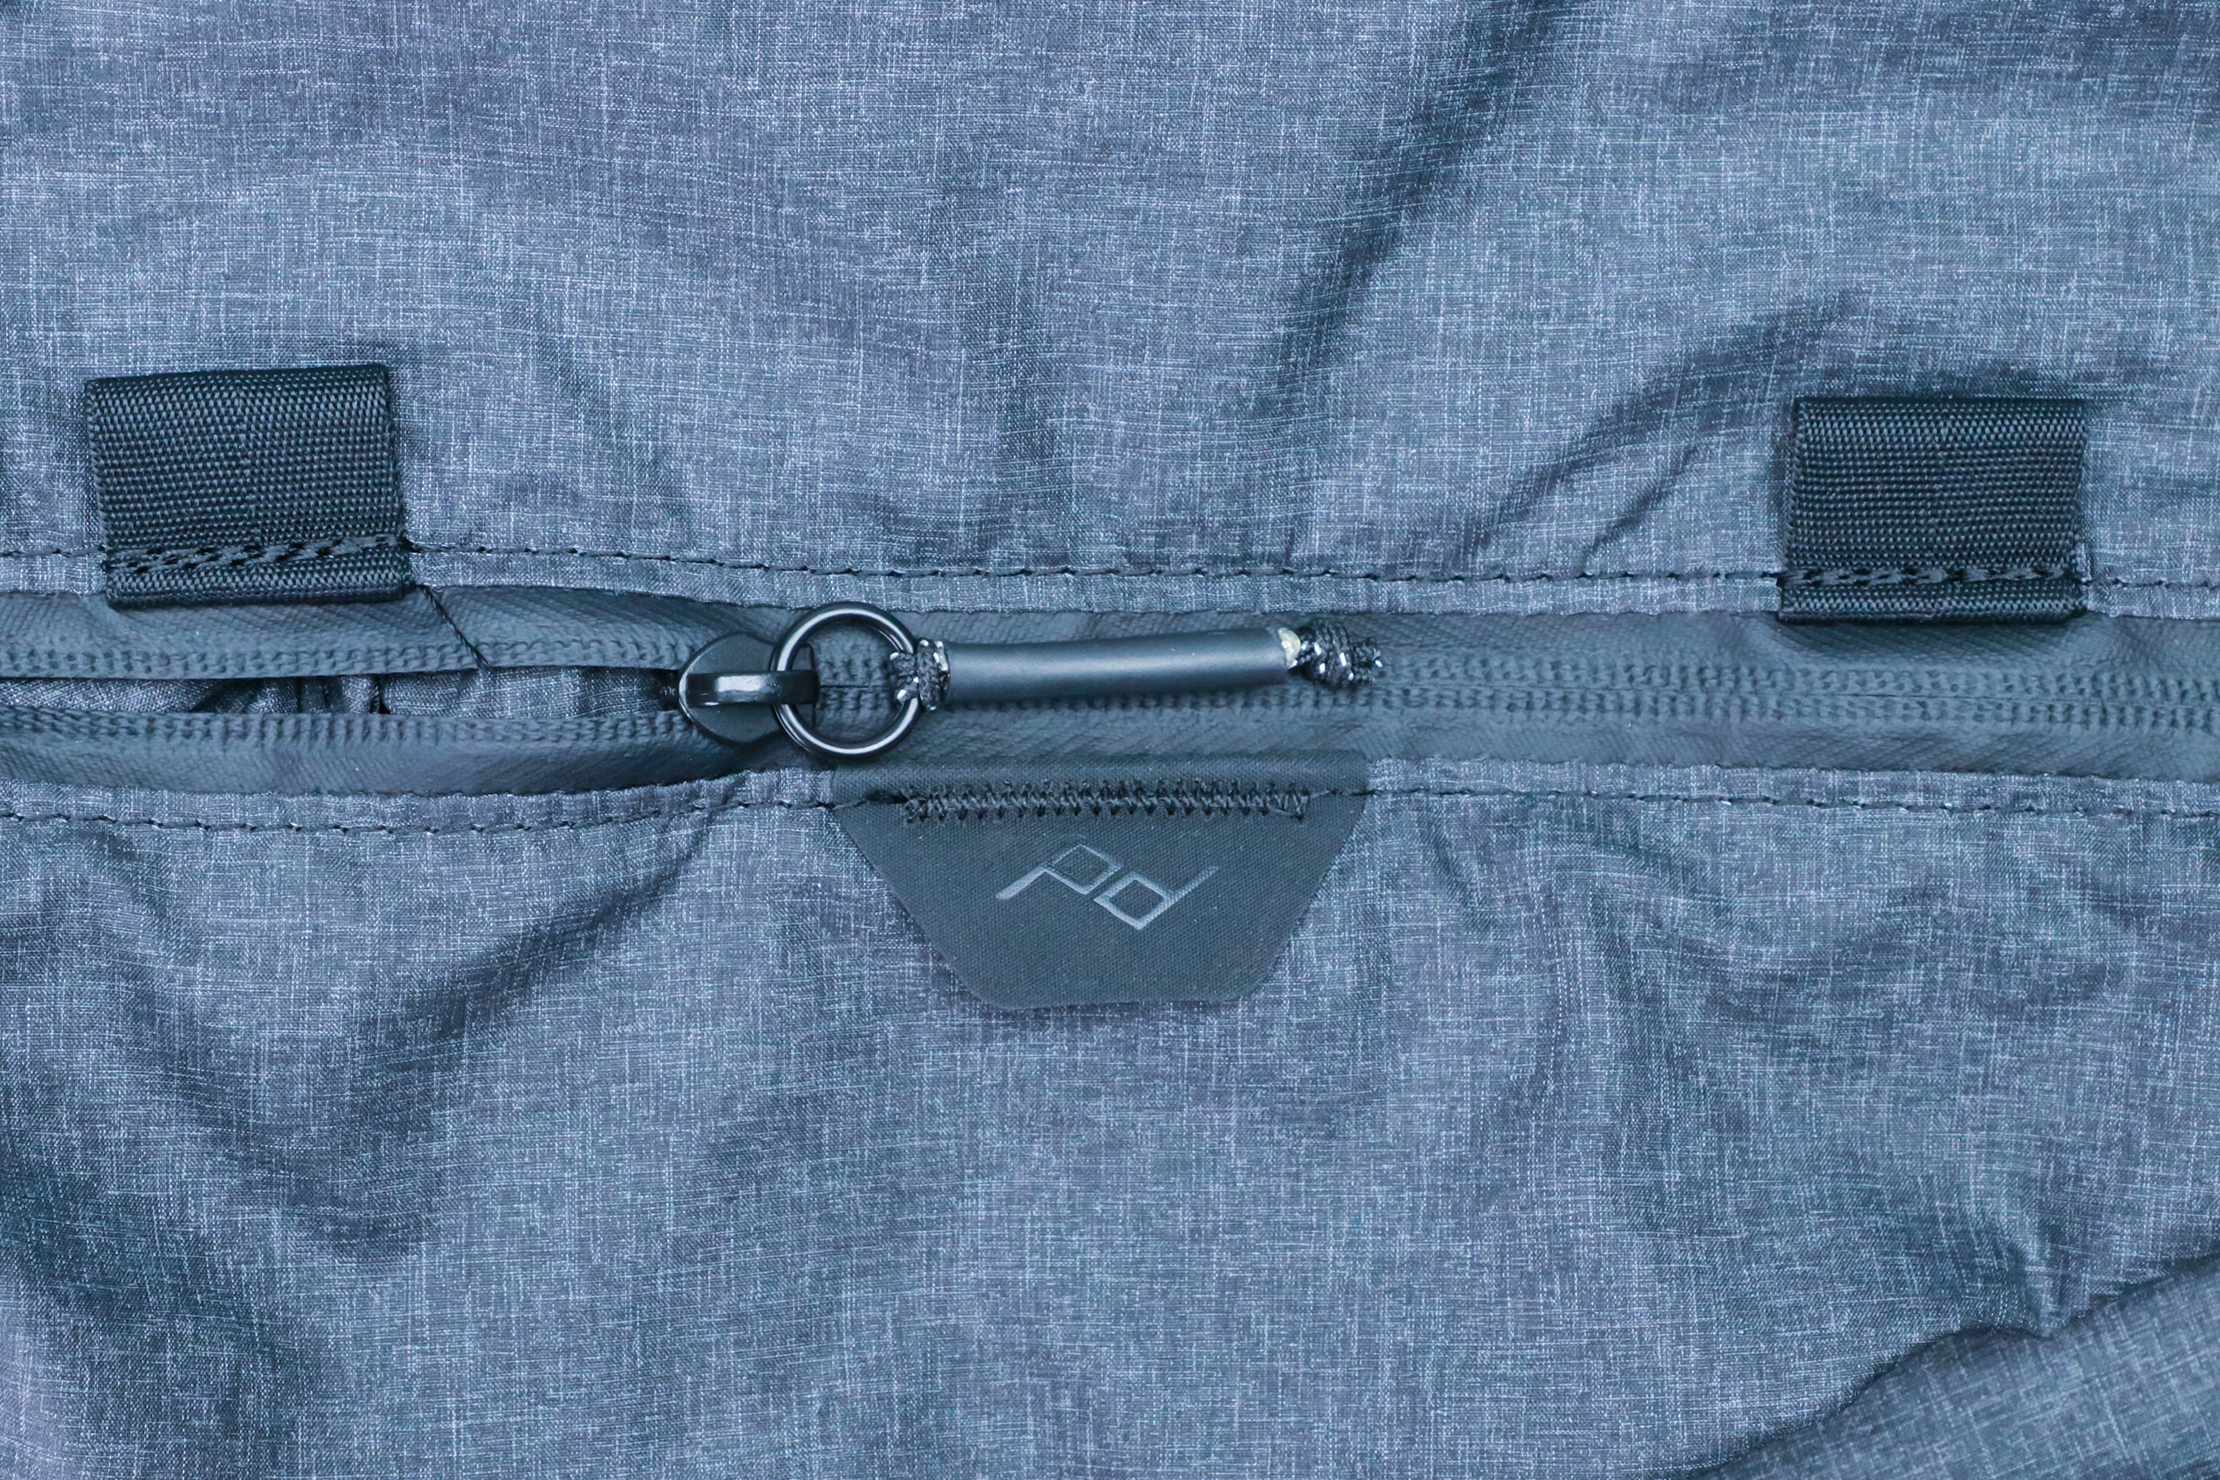 Peak Design Shoe Pouch zipper and logo